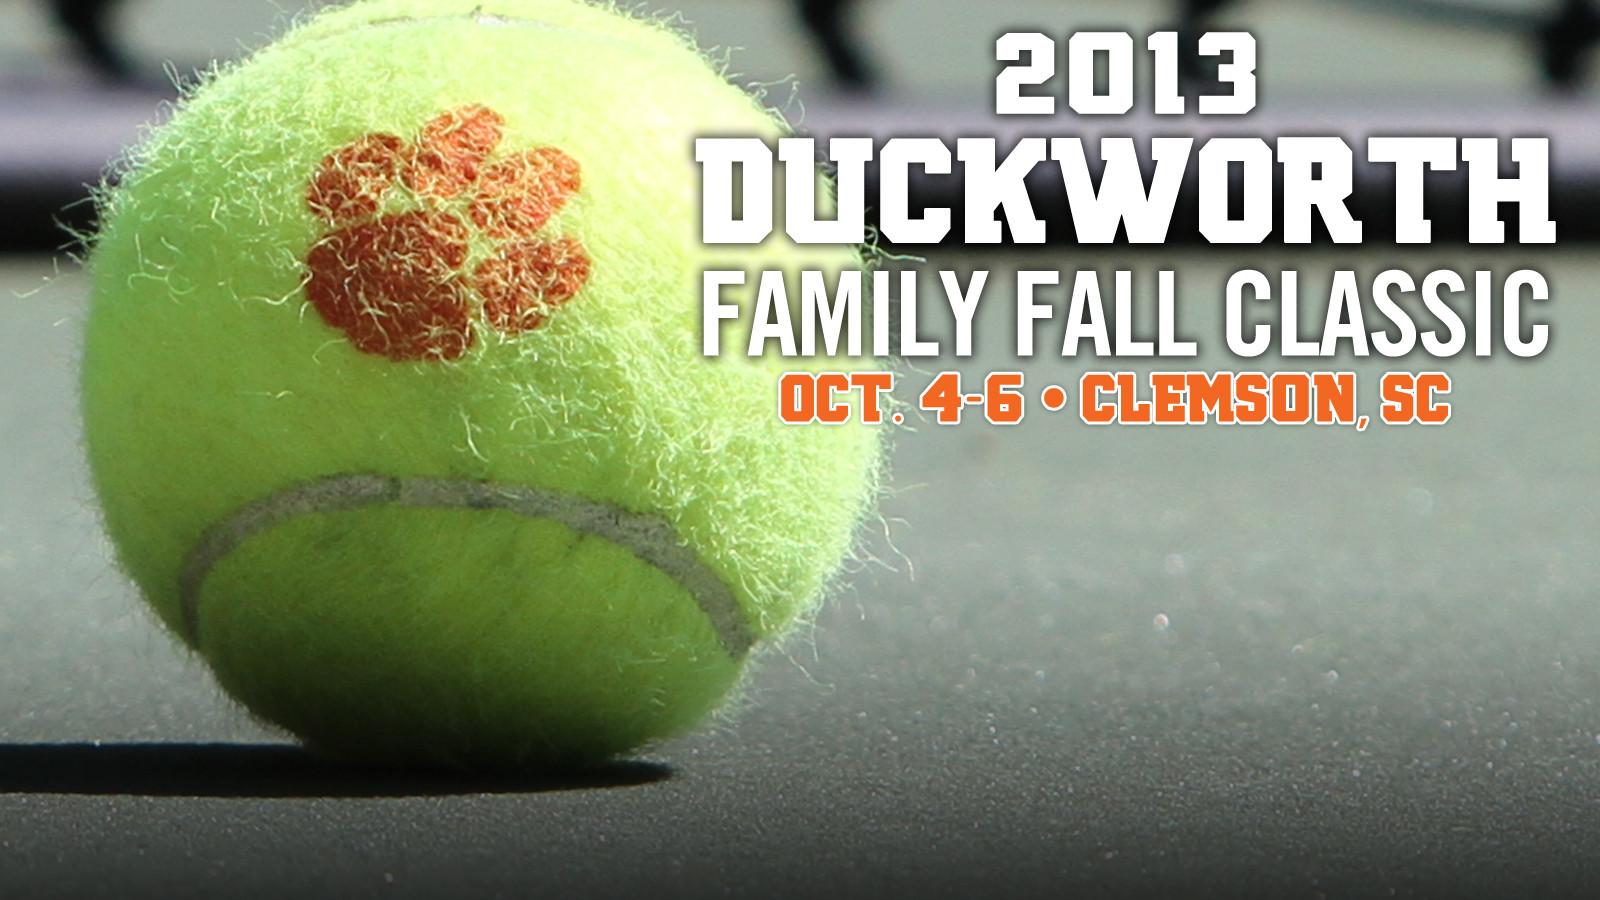 2013 Duckworth Family Fall Classic